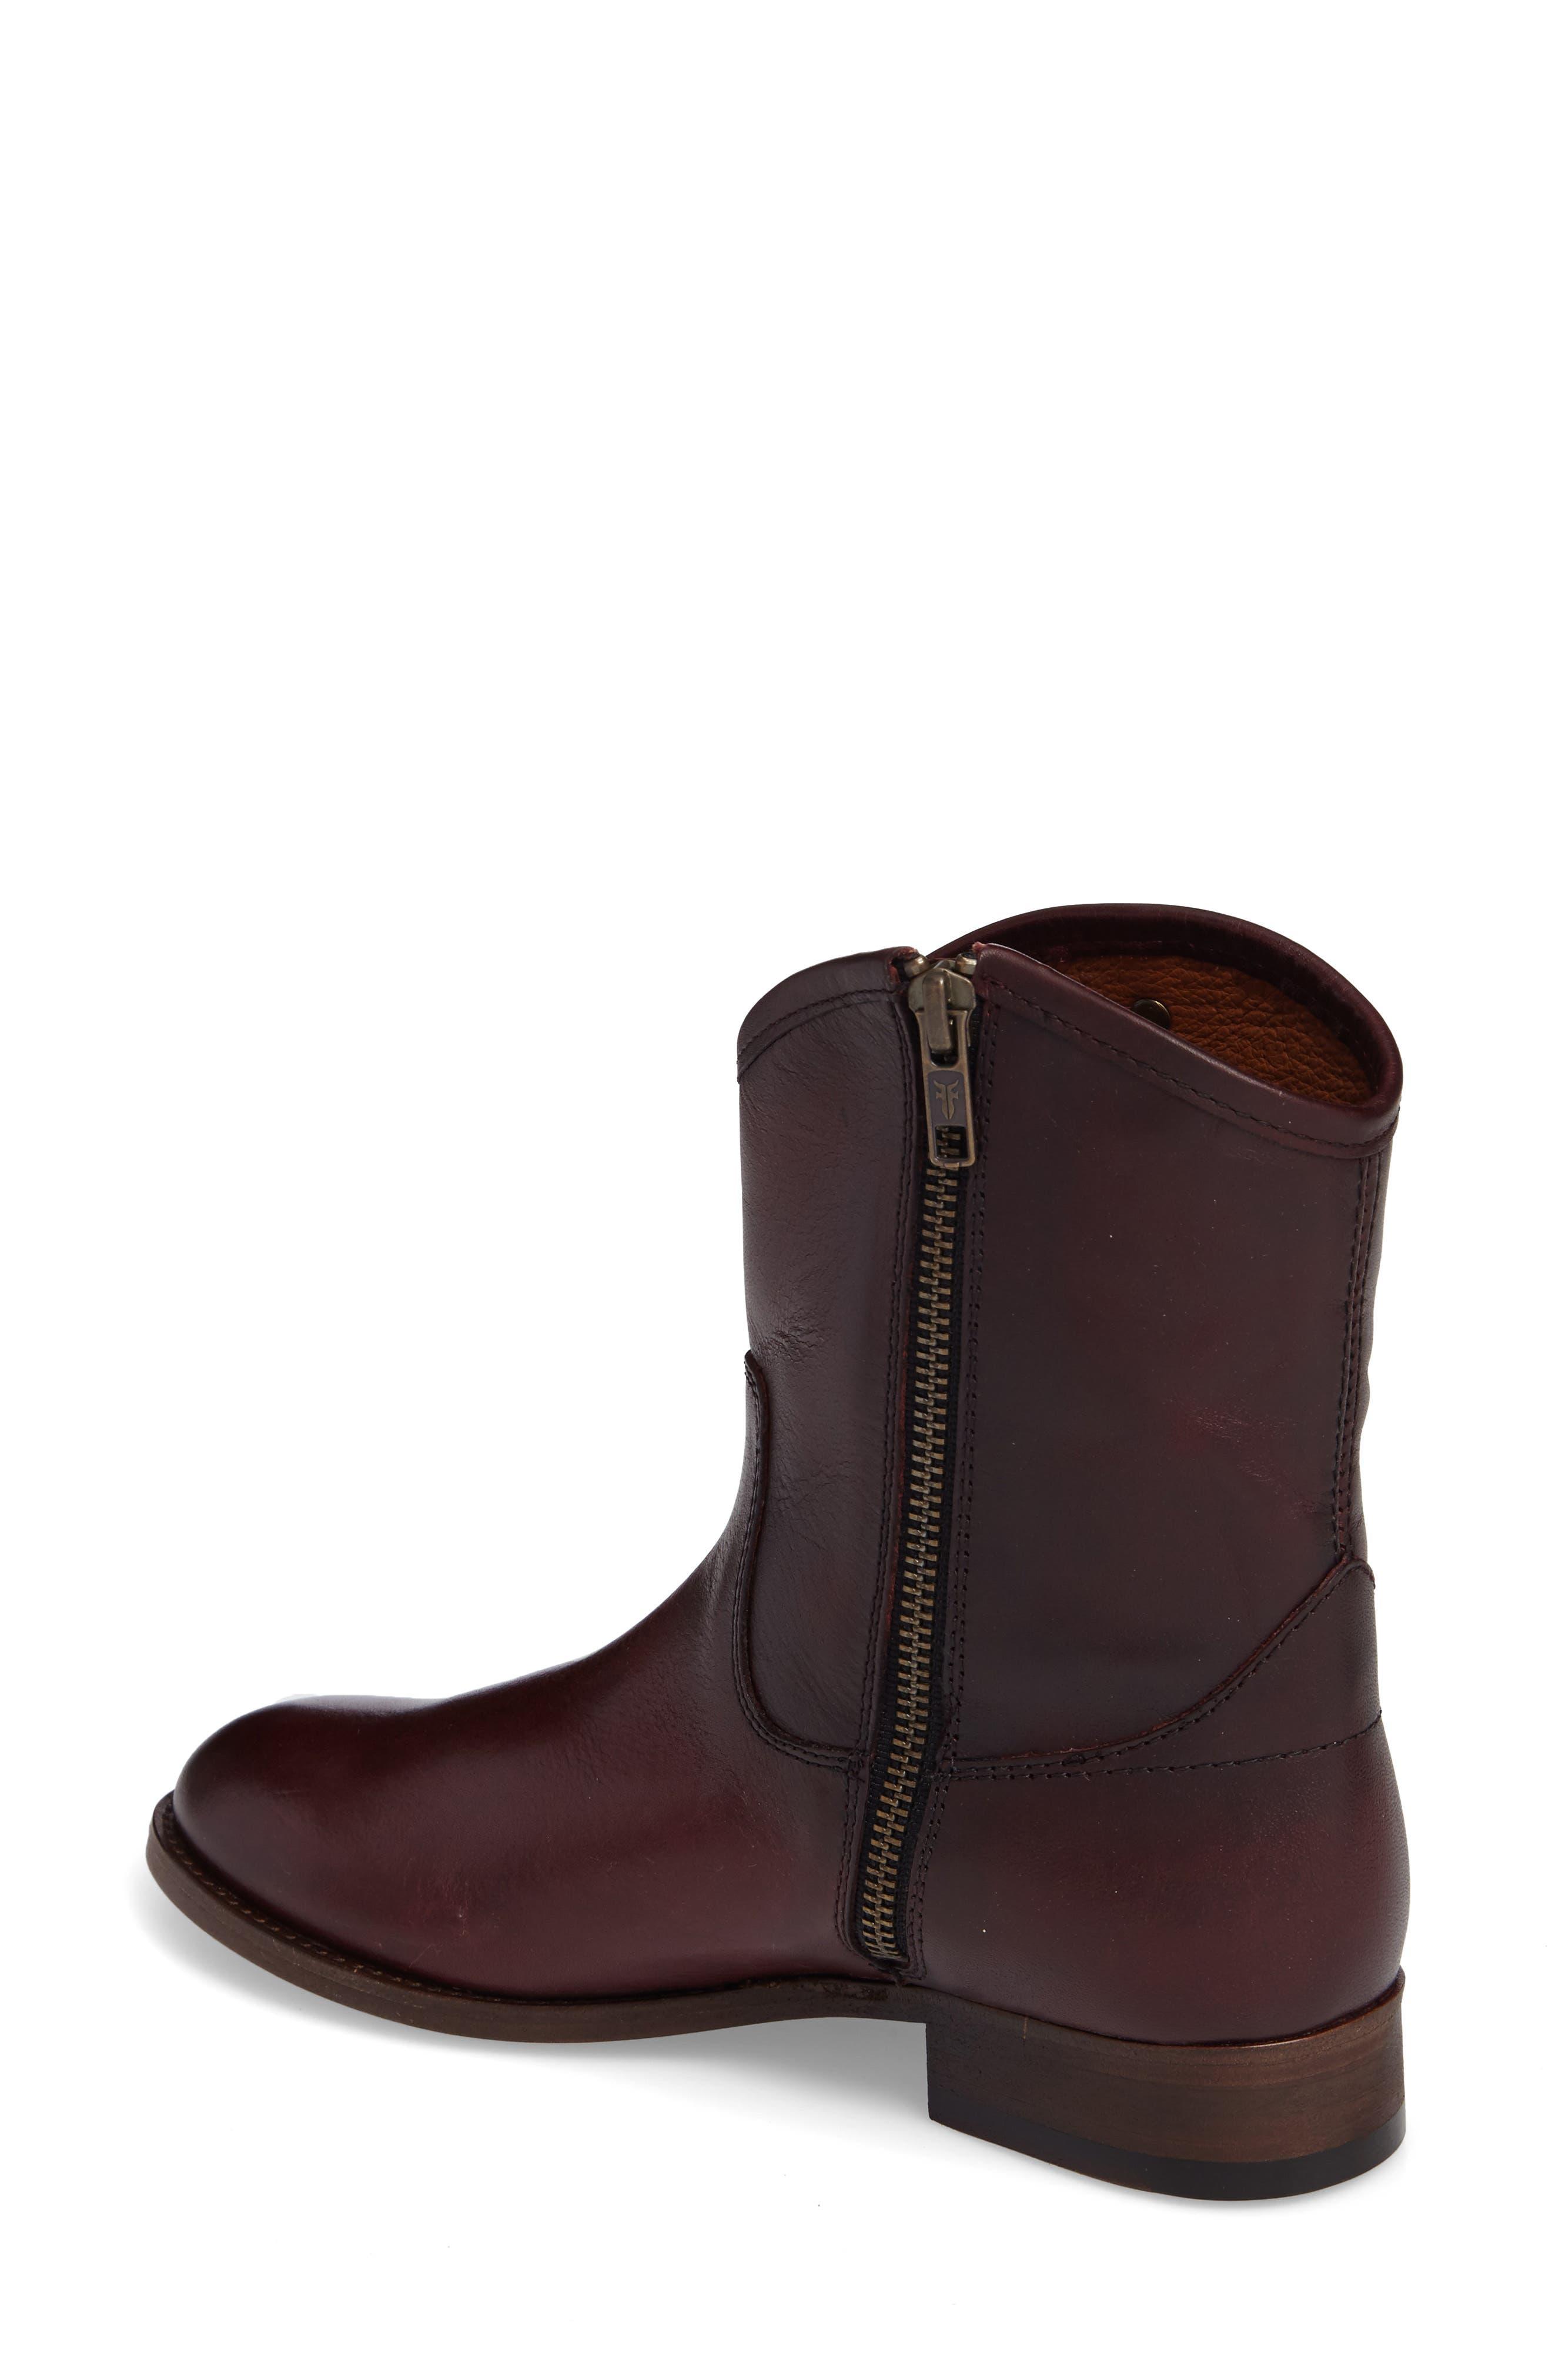 Melissa Short 2 Boot,                             Alternate thumbnail 2, color,                             Wine Leather